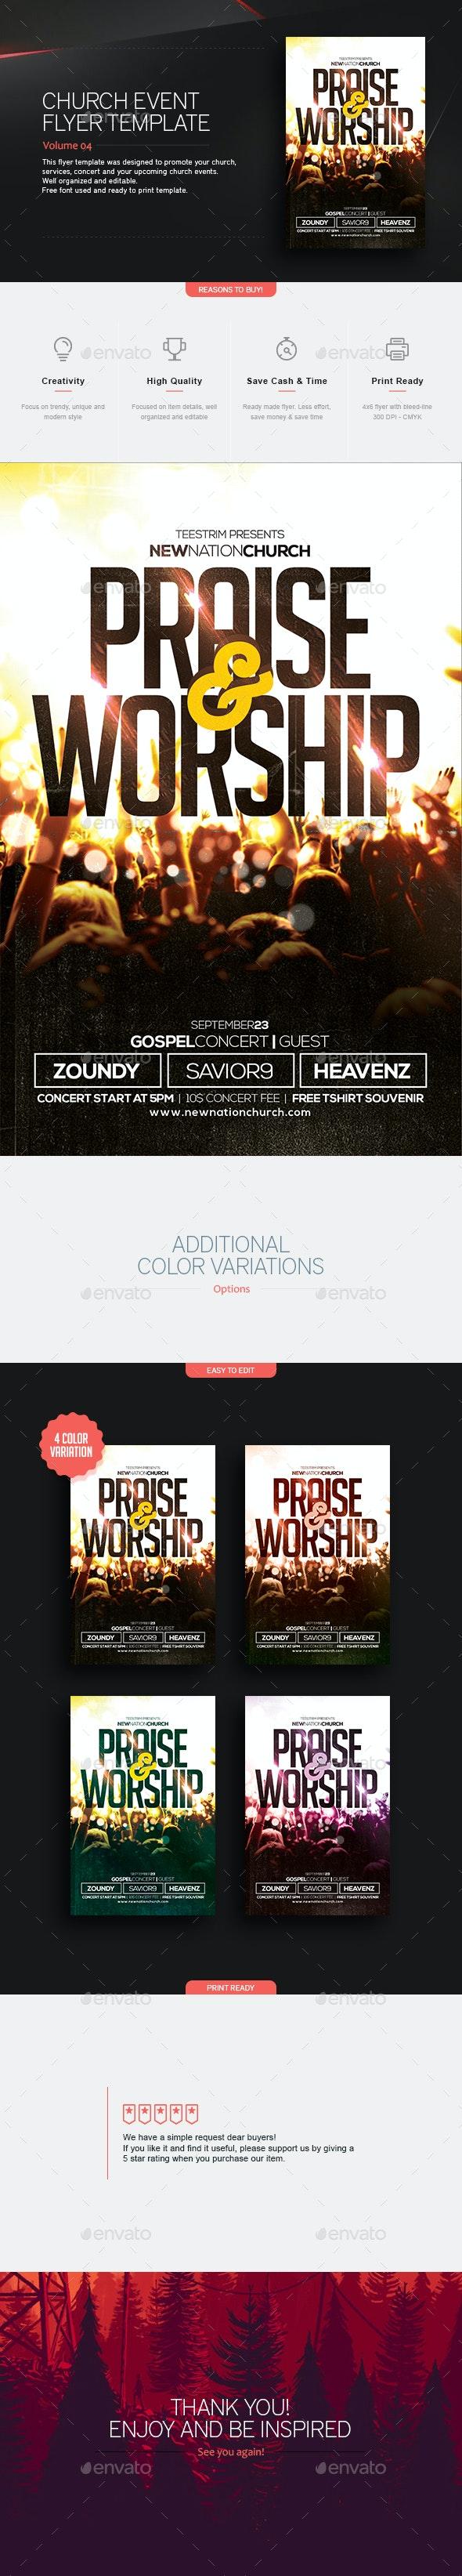 Praise And Worship - Church Flyer - Church Flyers